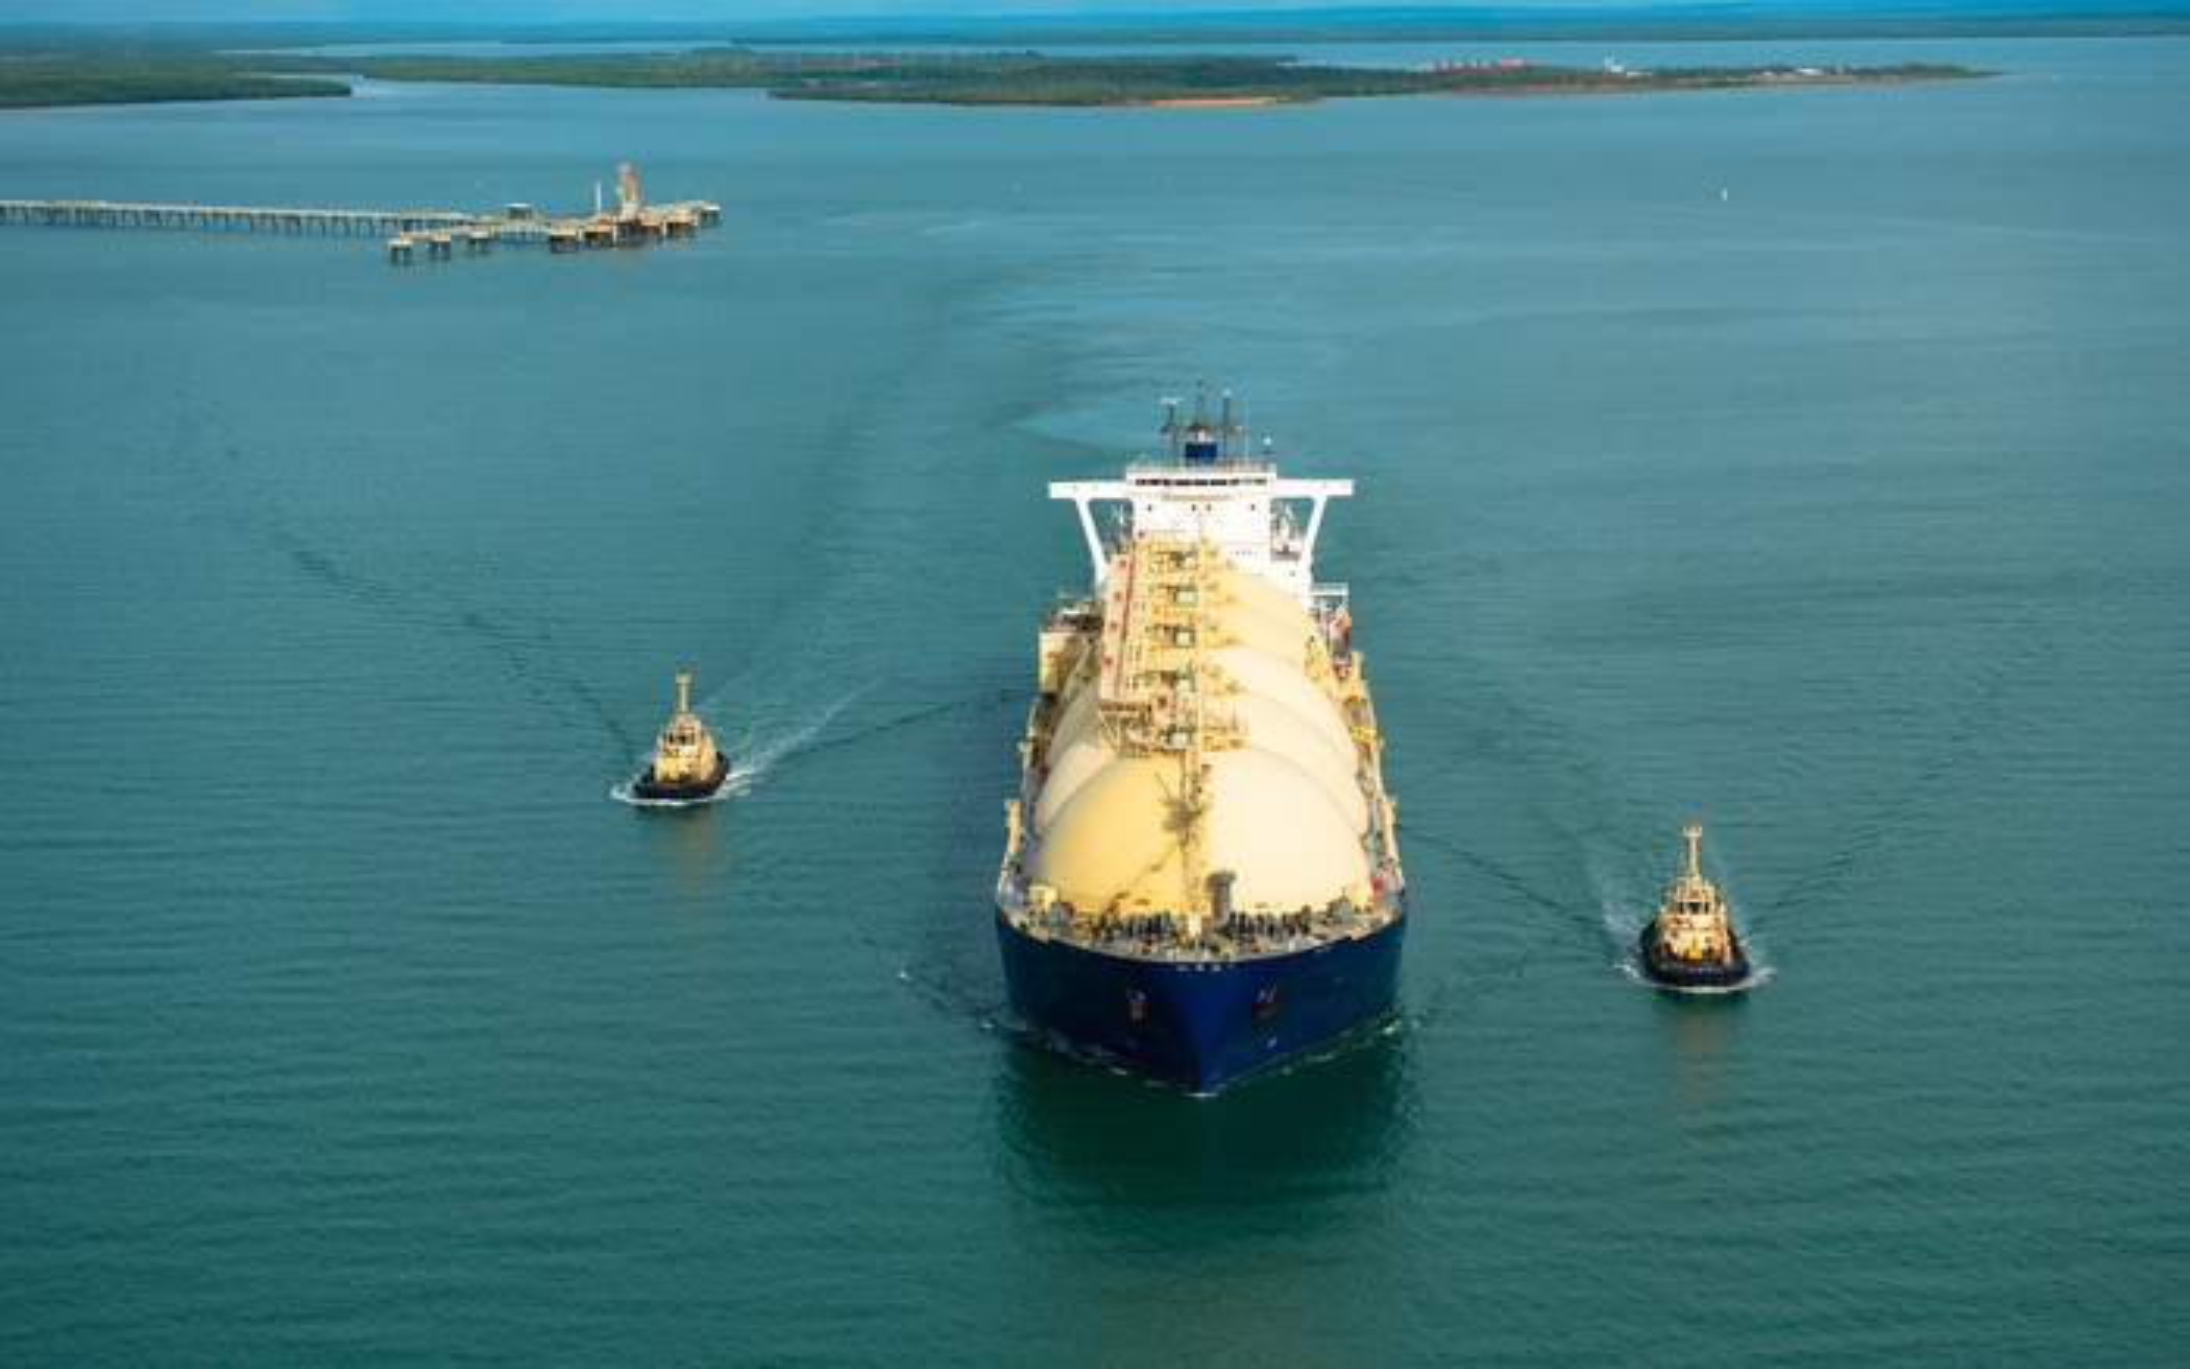 An LNG tanker leaving an export terminal.